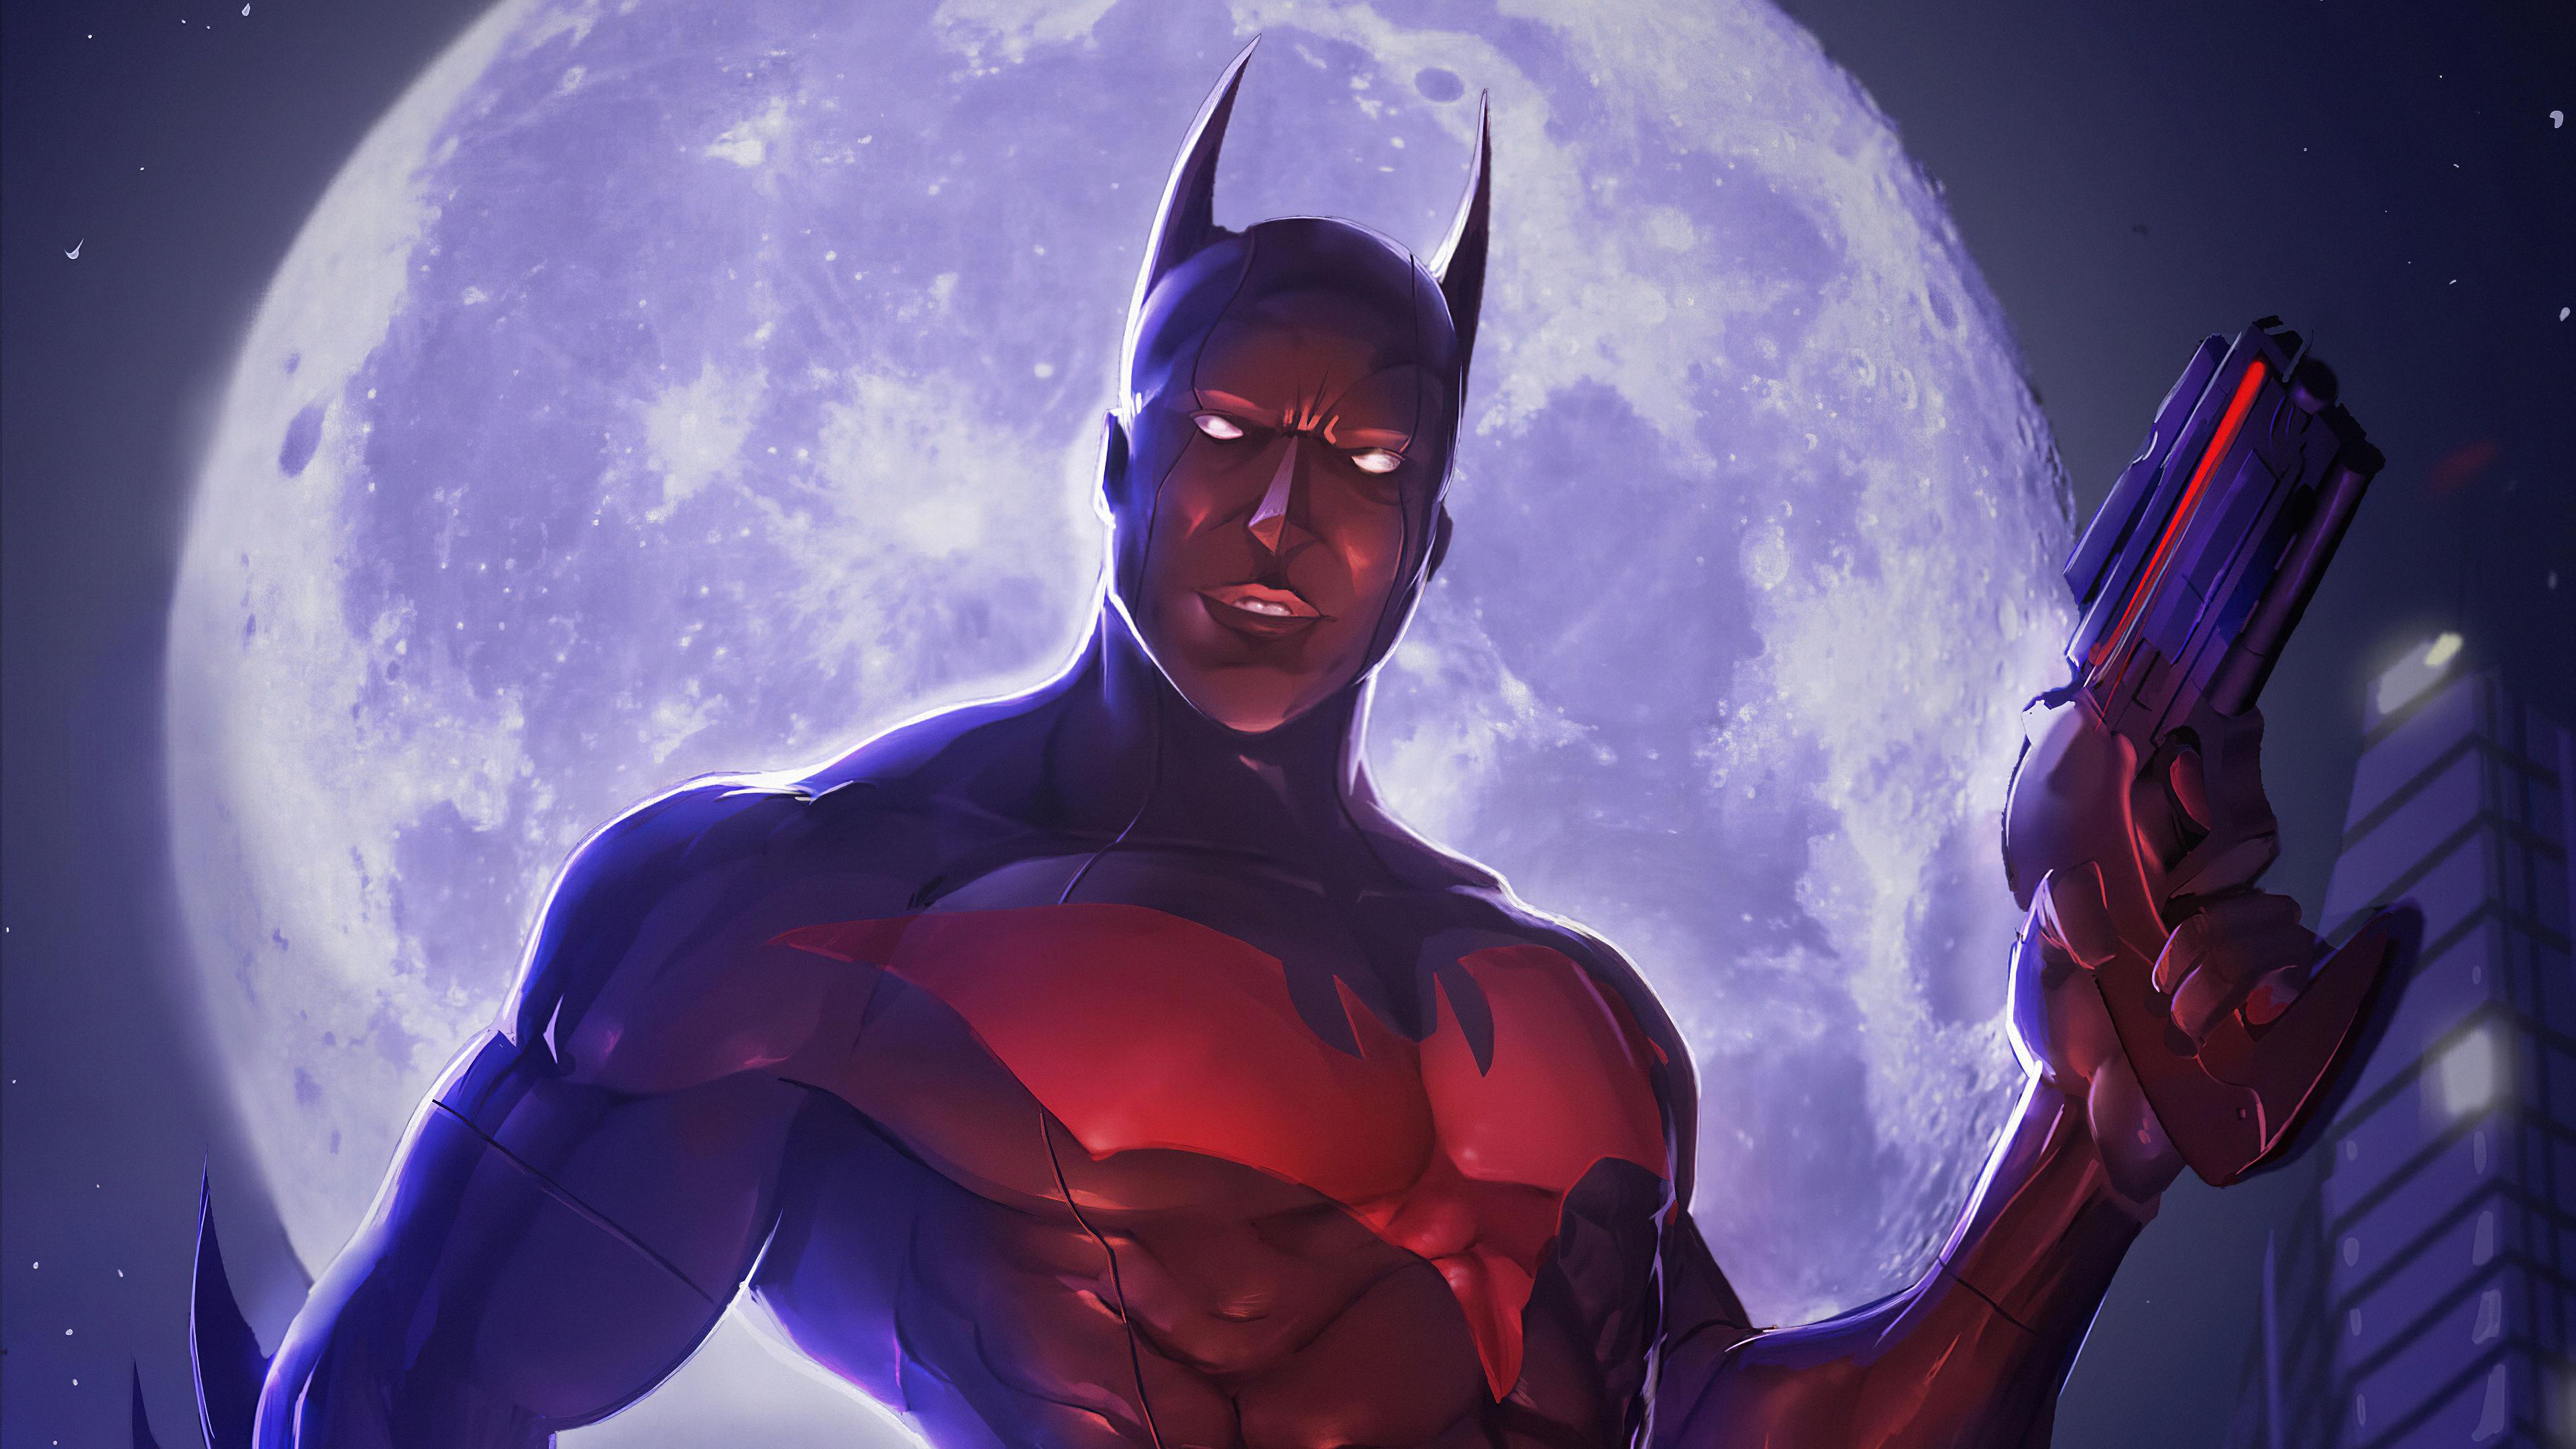 batman beyond artworks 1572368662 - Batman Beyond Artworks - superheroes wallpapers, portrait wallpapers, hd-wallpapers, batman wallpapers, artwork wallpapers, arstation wallpapers, 4k-wallpapers